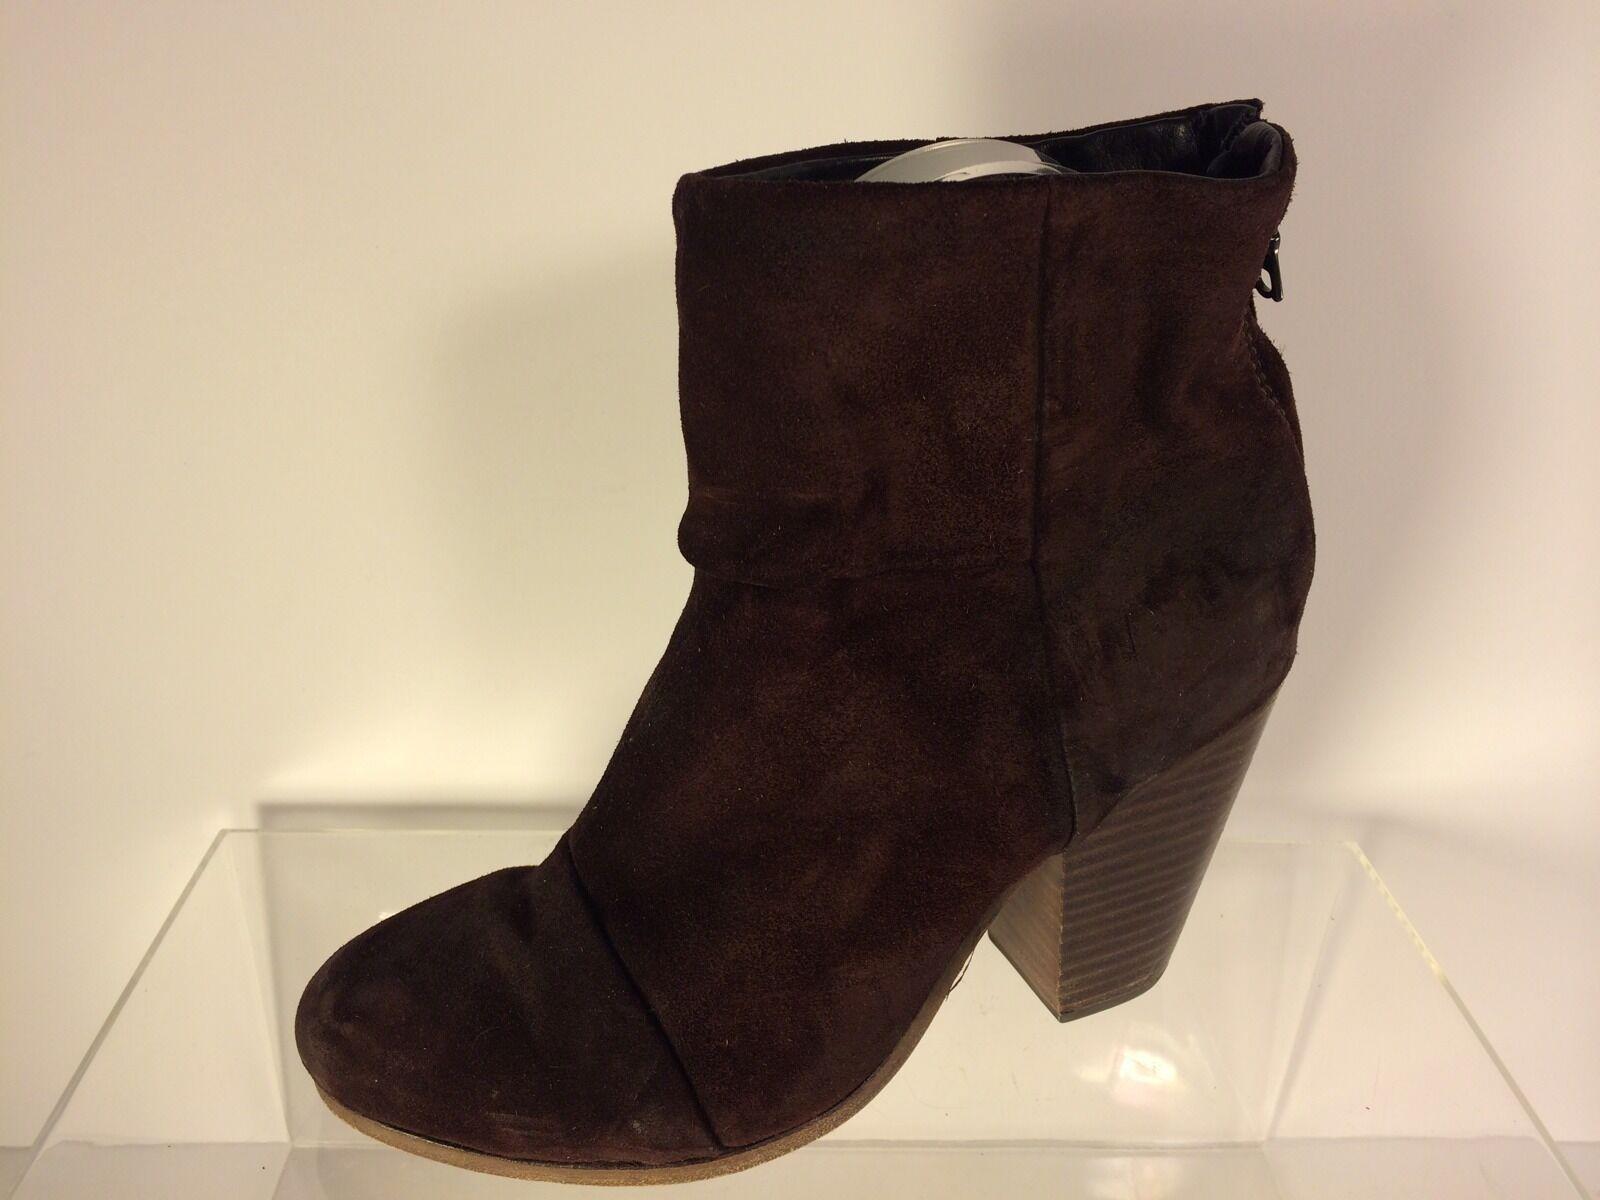 Rag Suede & Bone Damens Braun Suede Rag  Leder Stiefel 36.5 e76d40